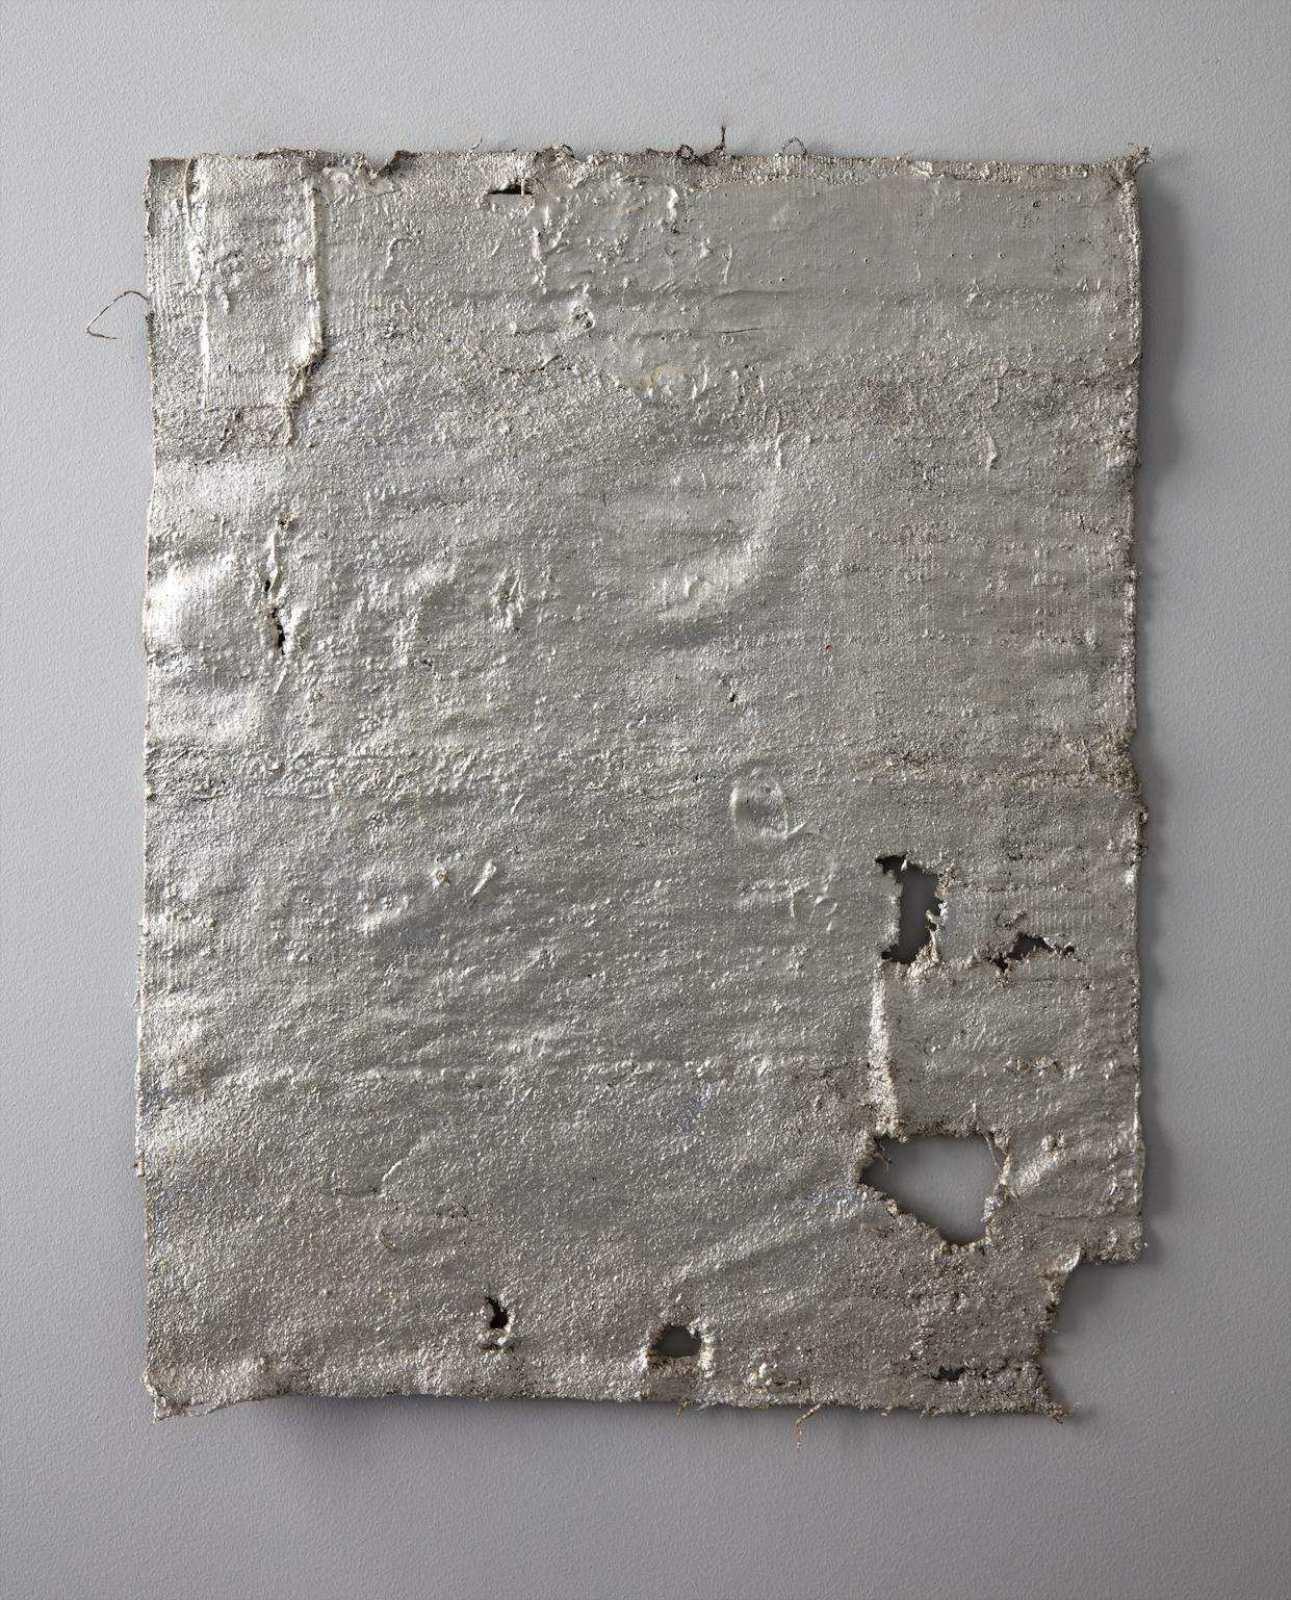 Lenity, Leo III the Isaurian, 2017, anatolian yastik, rubber, silverleaf, lacquer, 63,5 x 51,5 cm